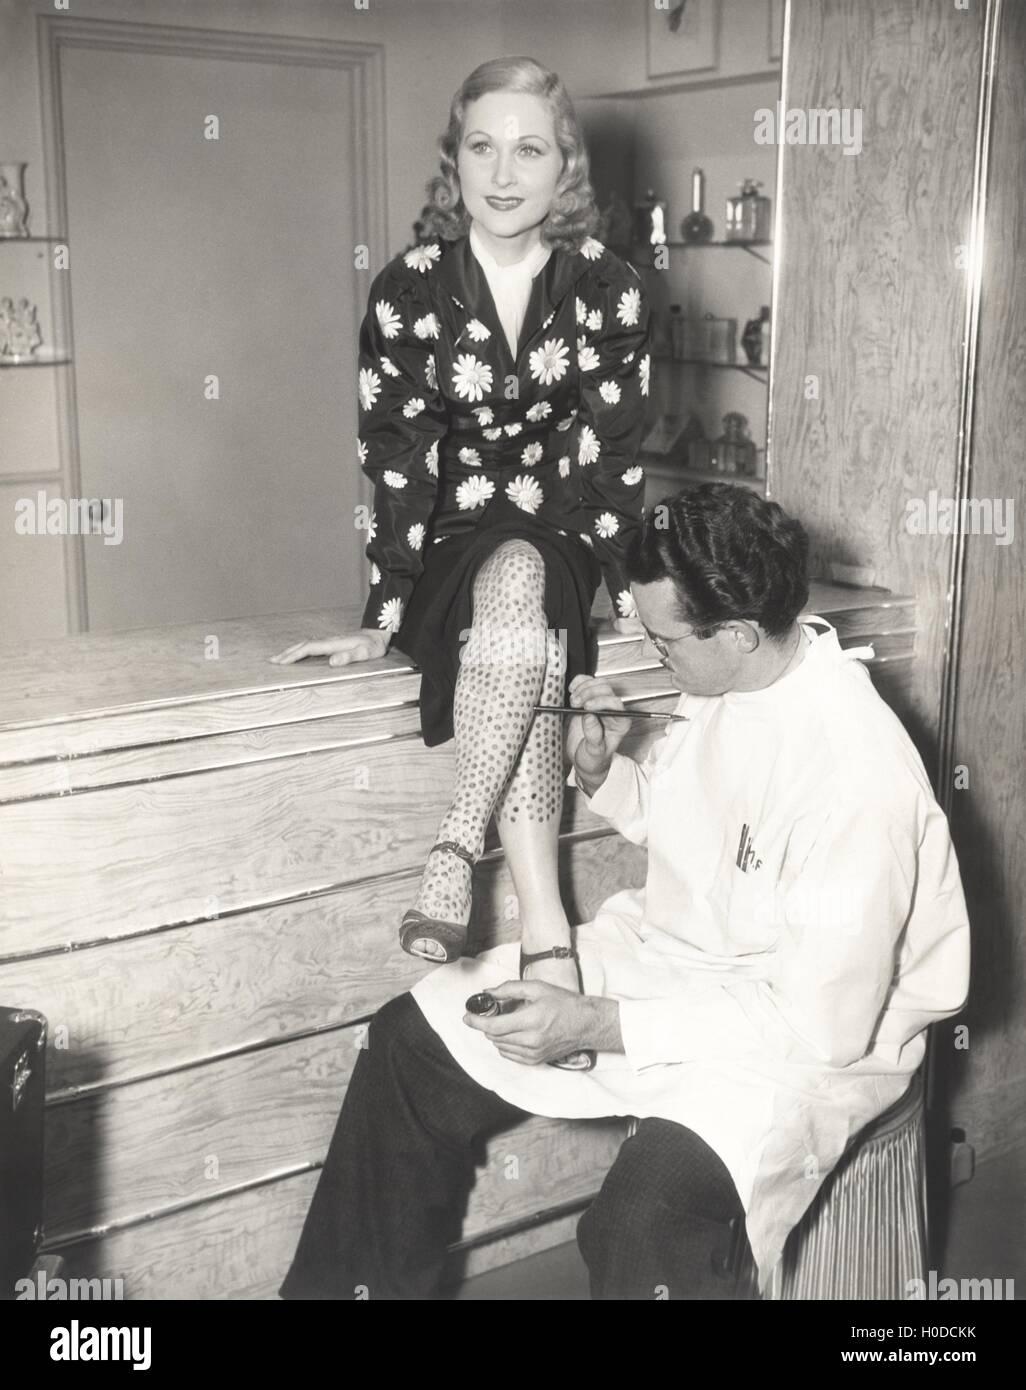 Makeup artist painting stockings on woman's legs - Stock Image